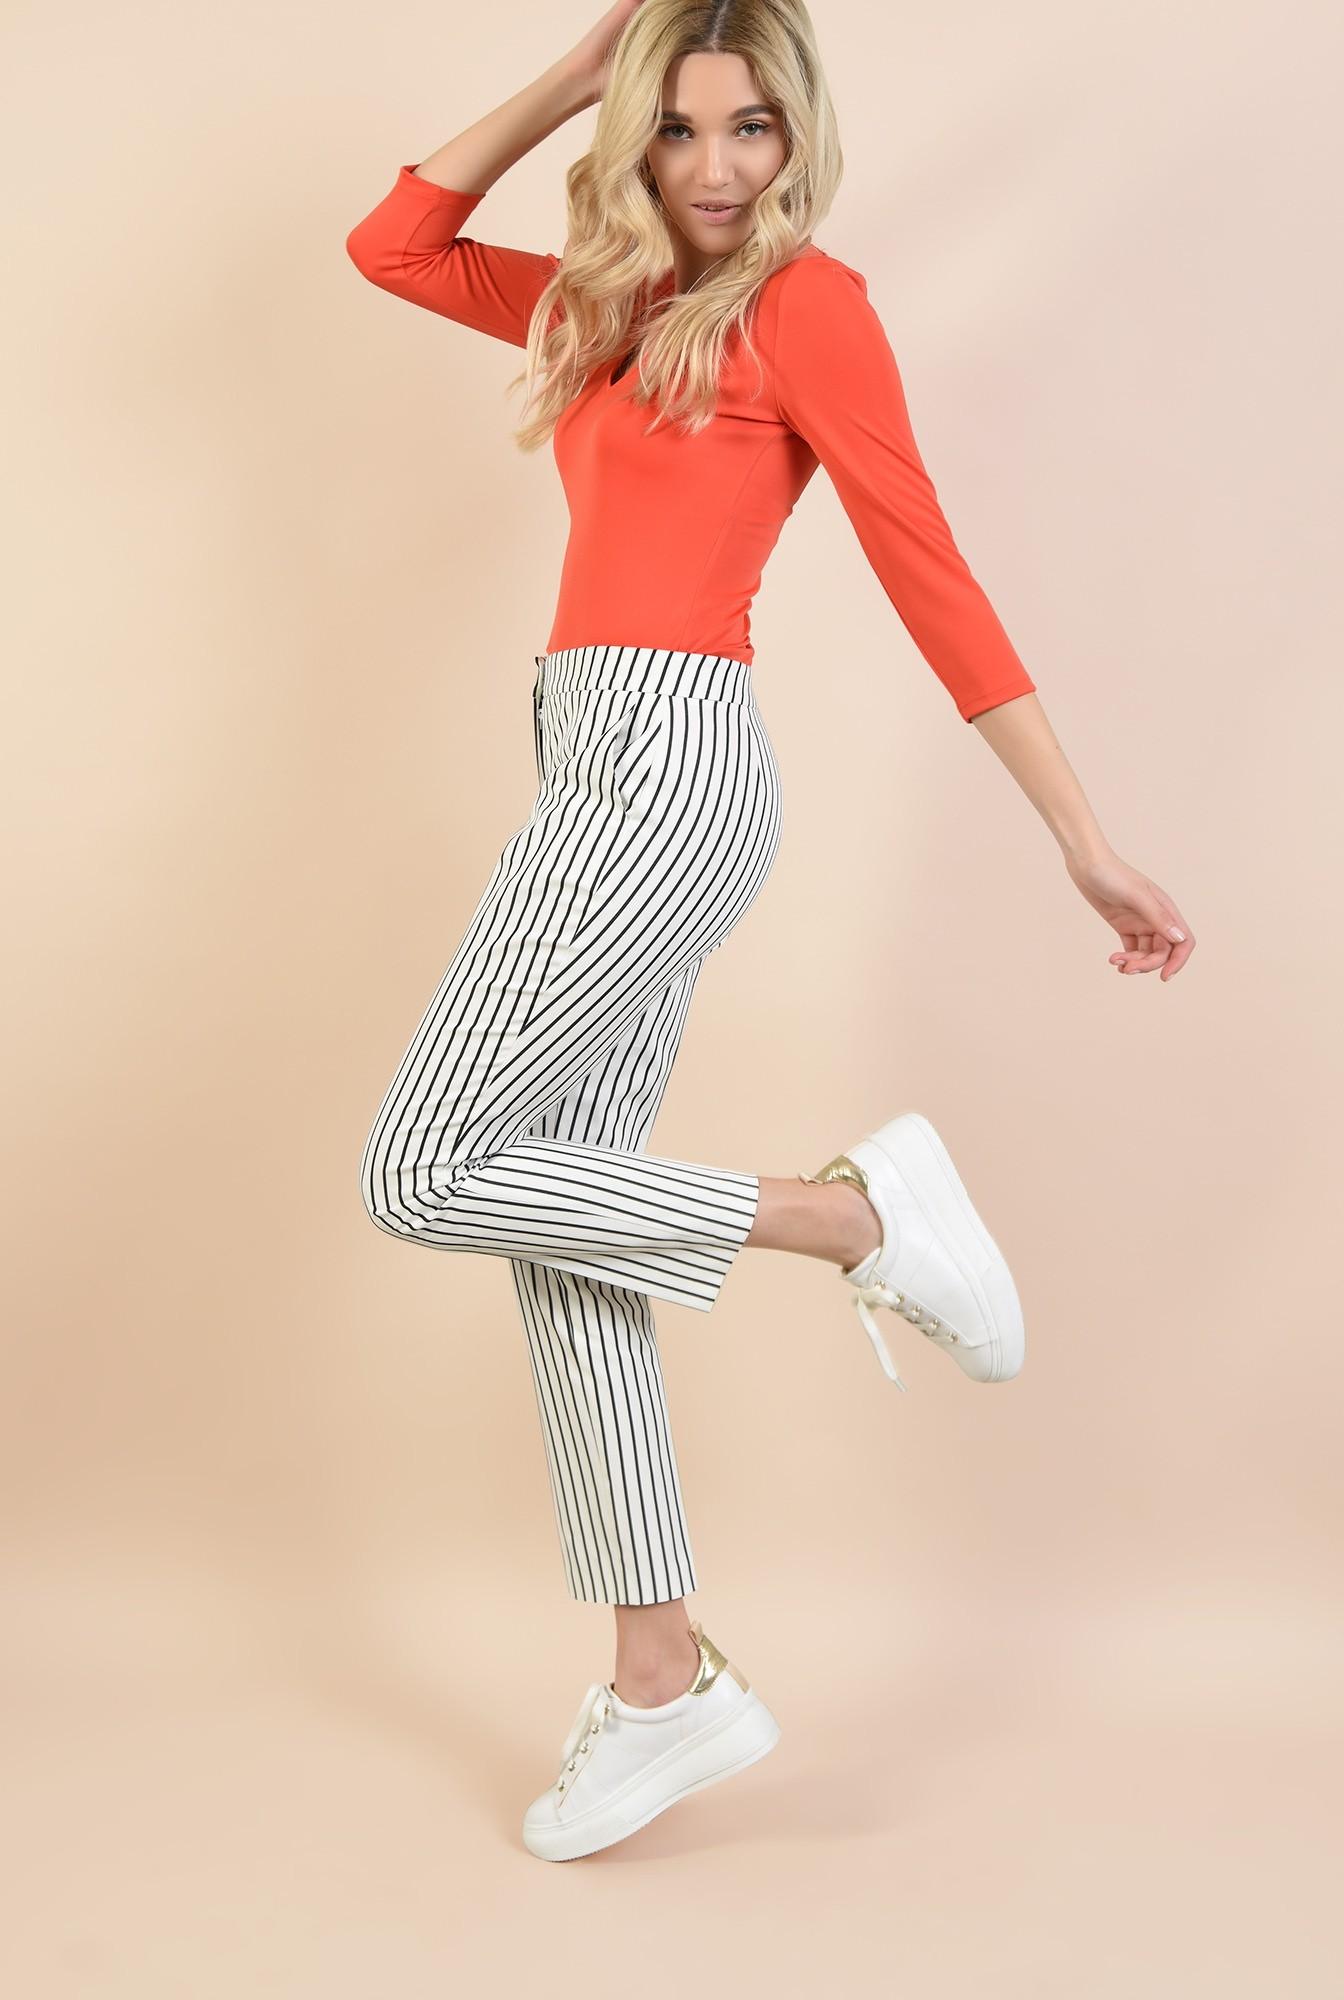 0 - pantaloni casual, cu dungi, conici, buzunare in cusatura